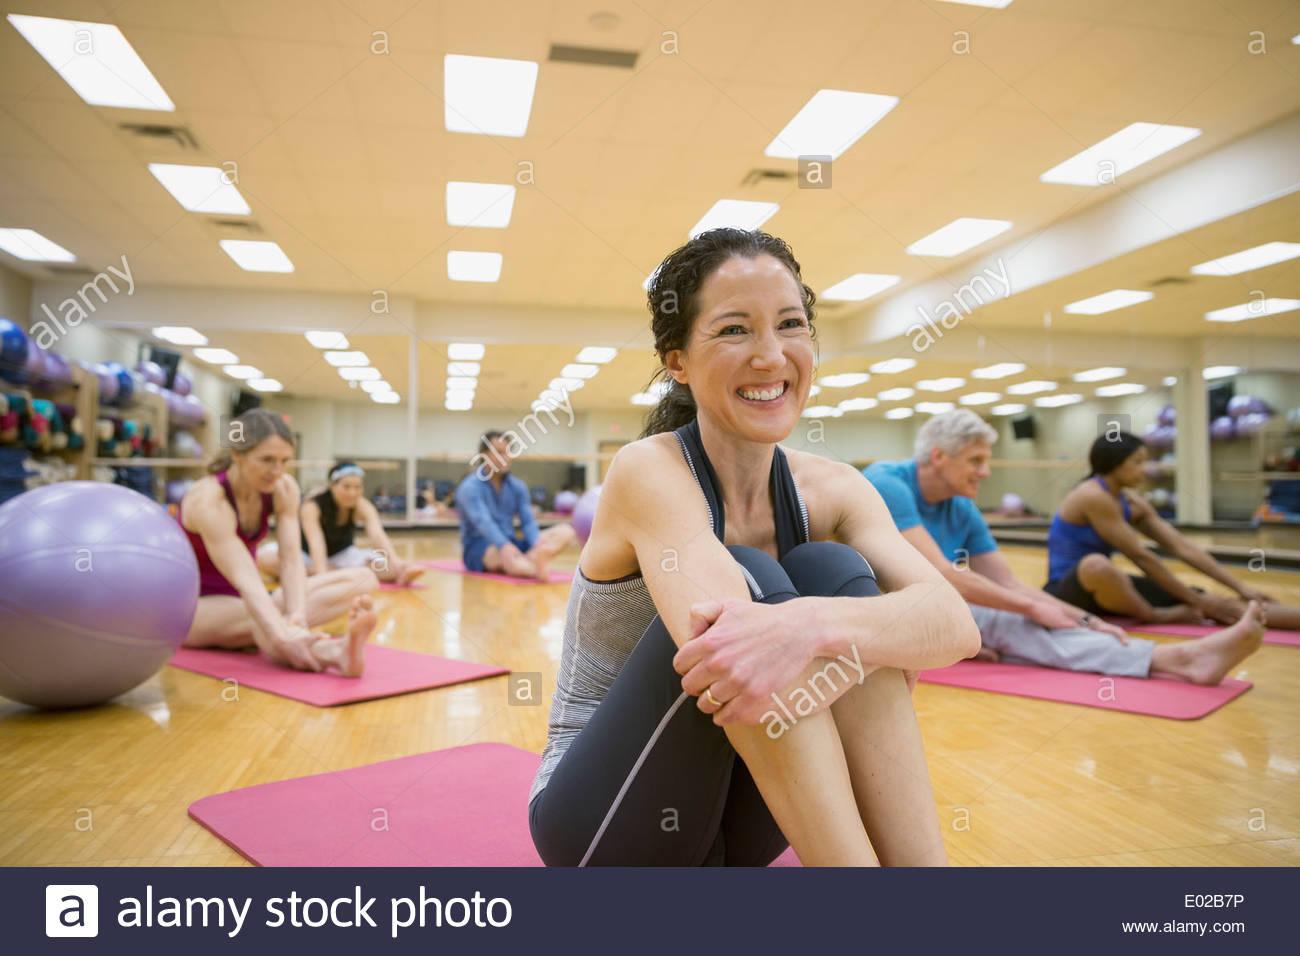 Lächelnde Frau auf Yoga-Matte in Übung Stockbild